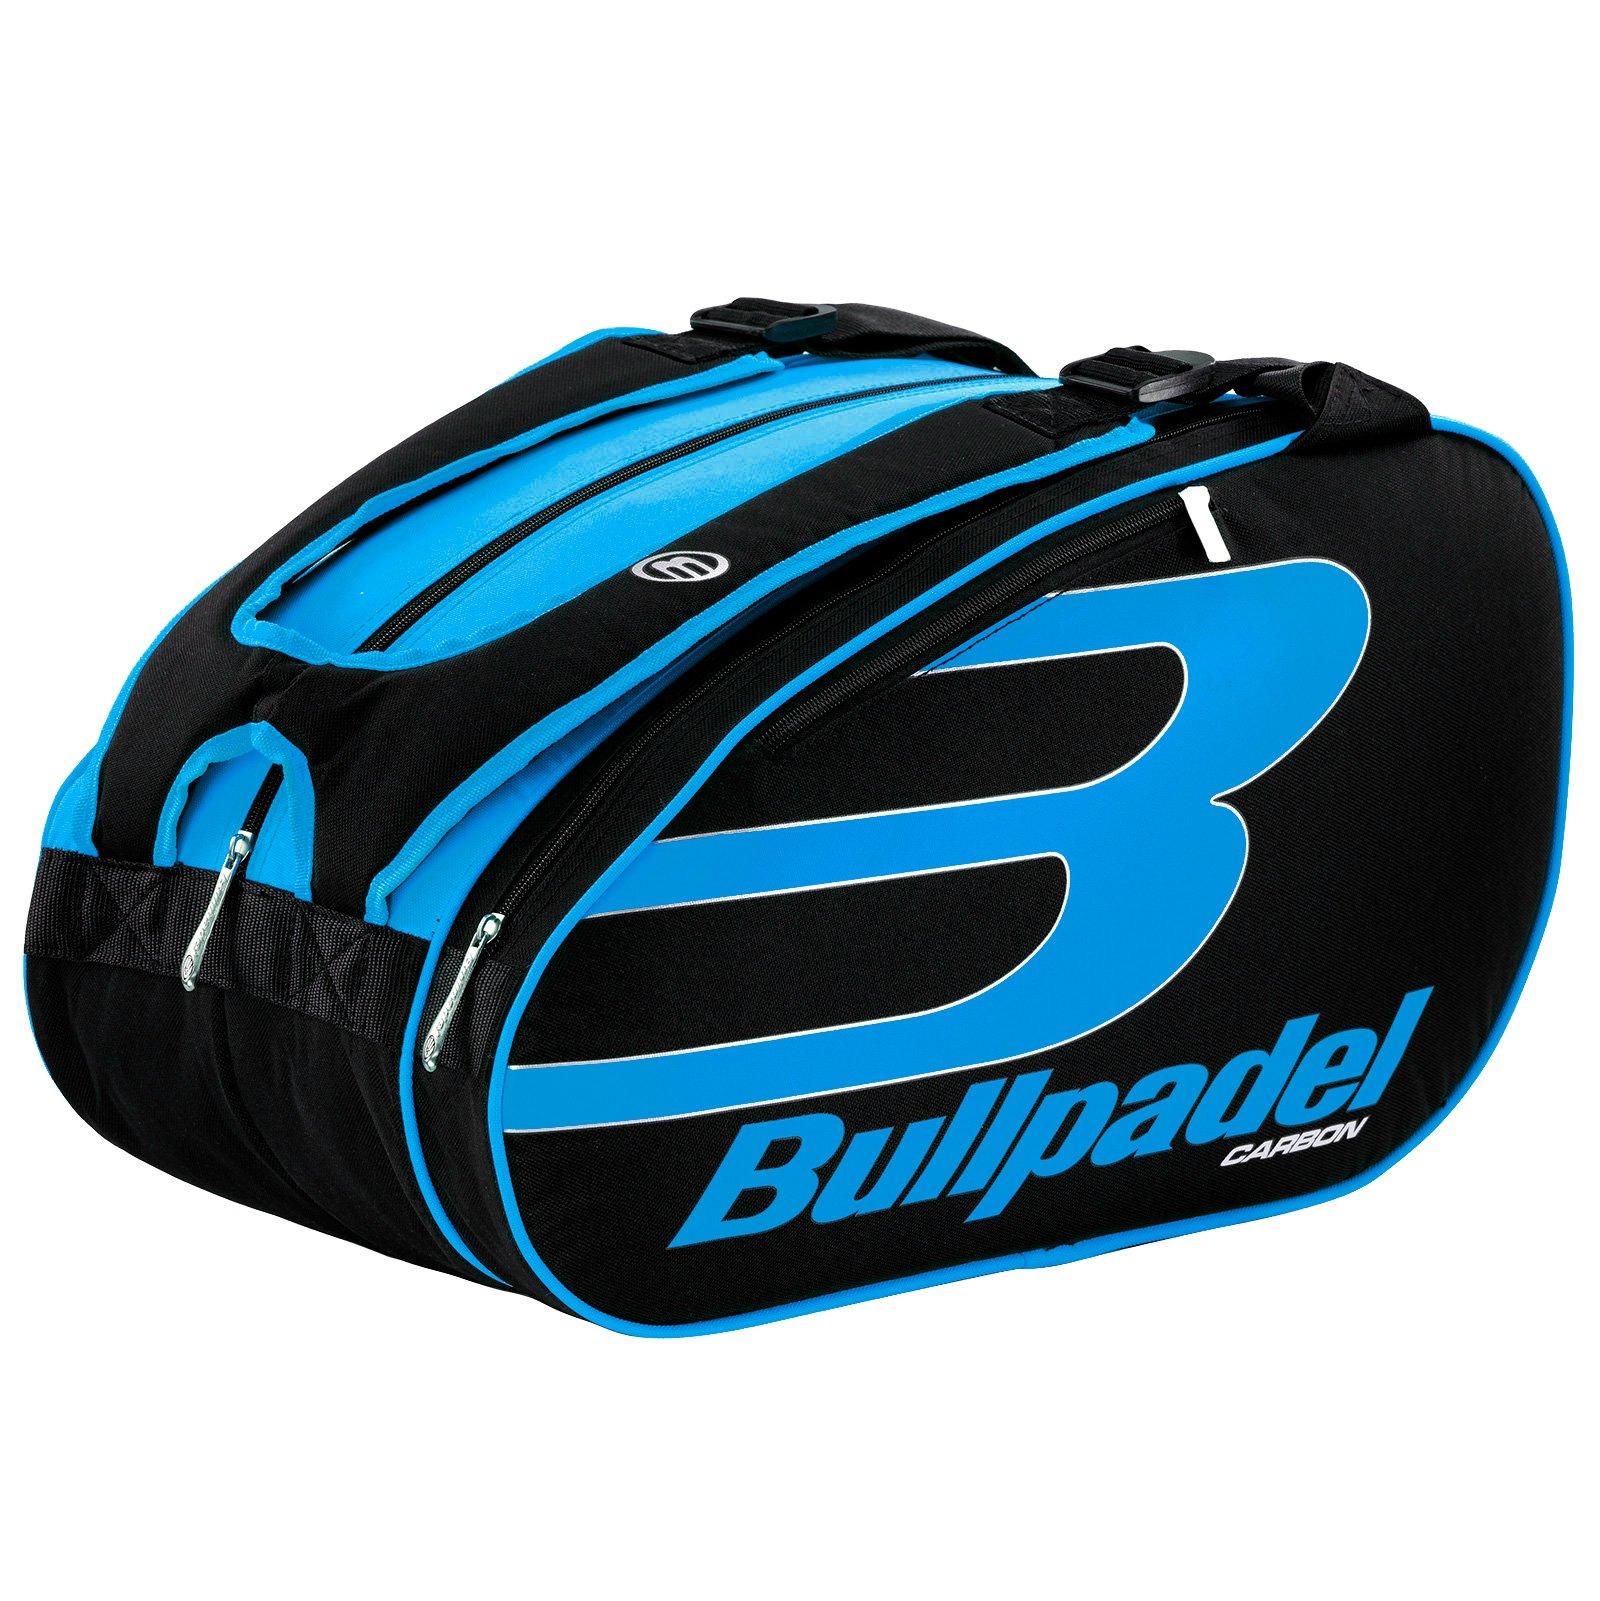 Paletero Bullpadel 18004 Azul Flúor product image